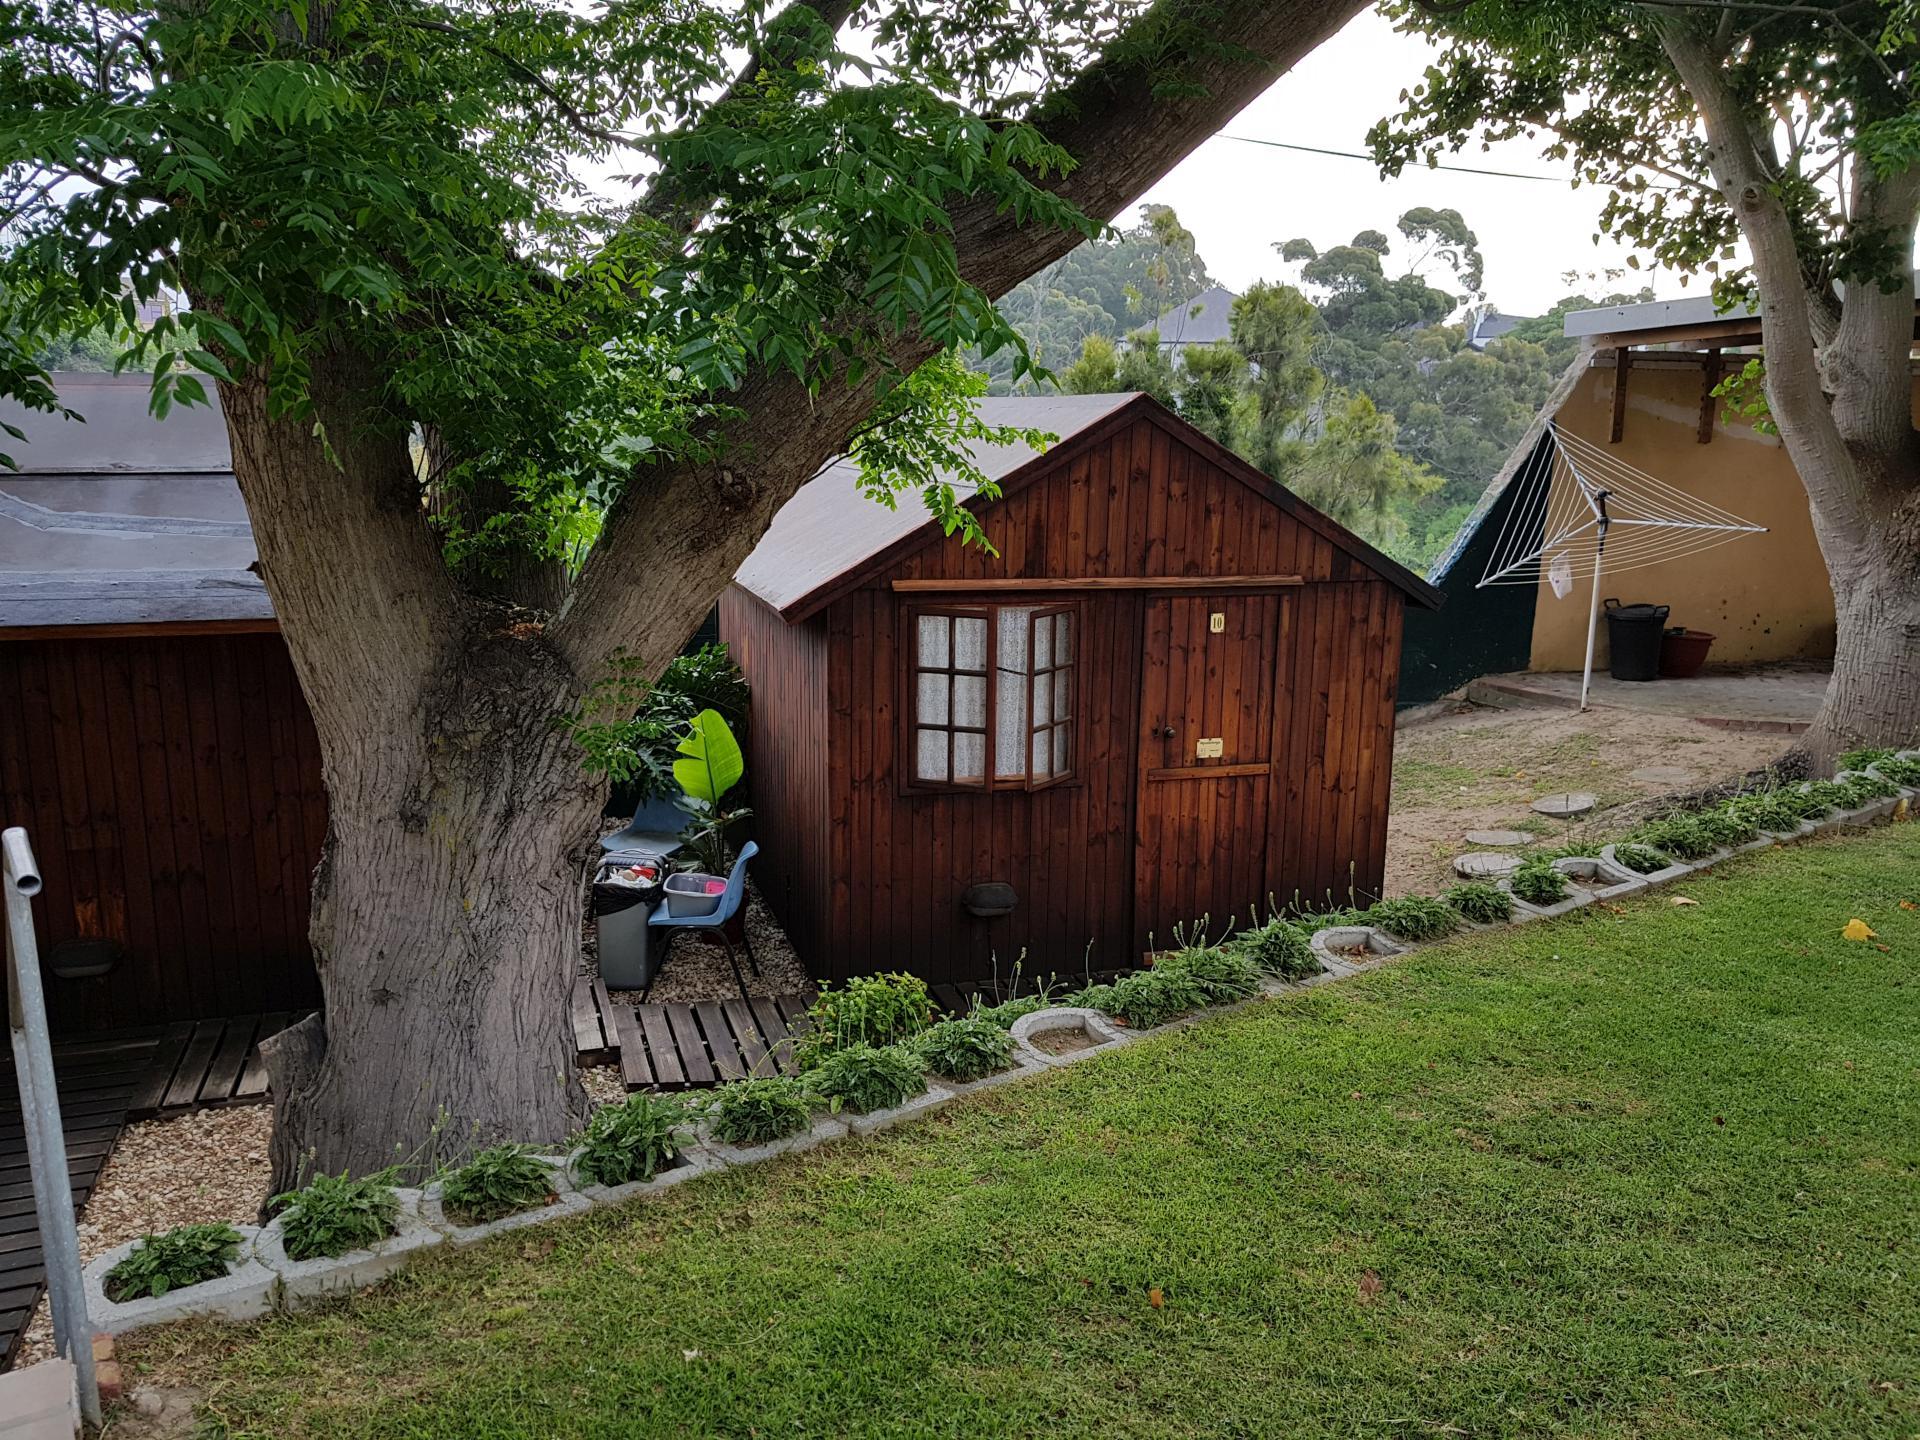 домик в Jikeleza Lodge, Порт-Элизабет